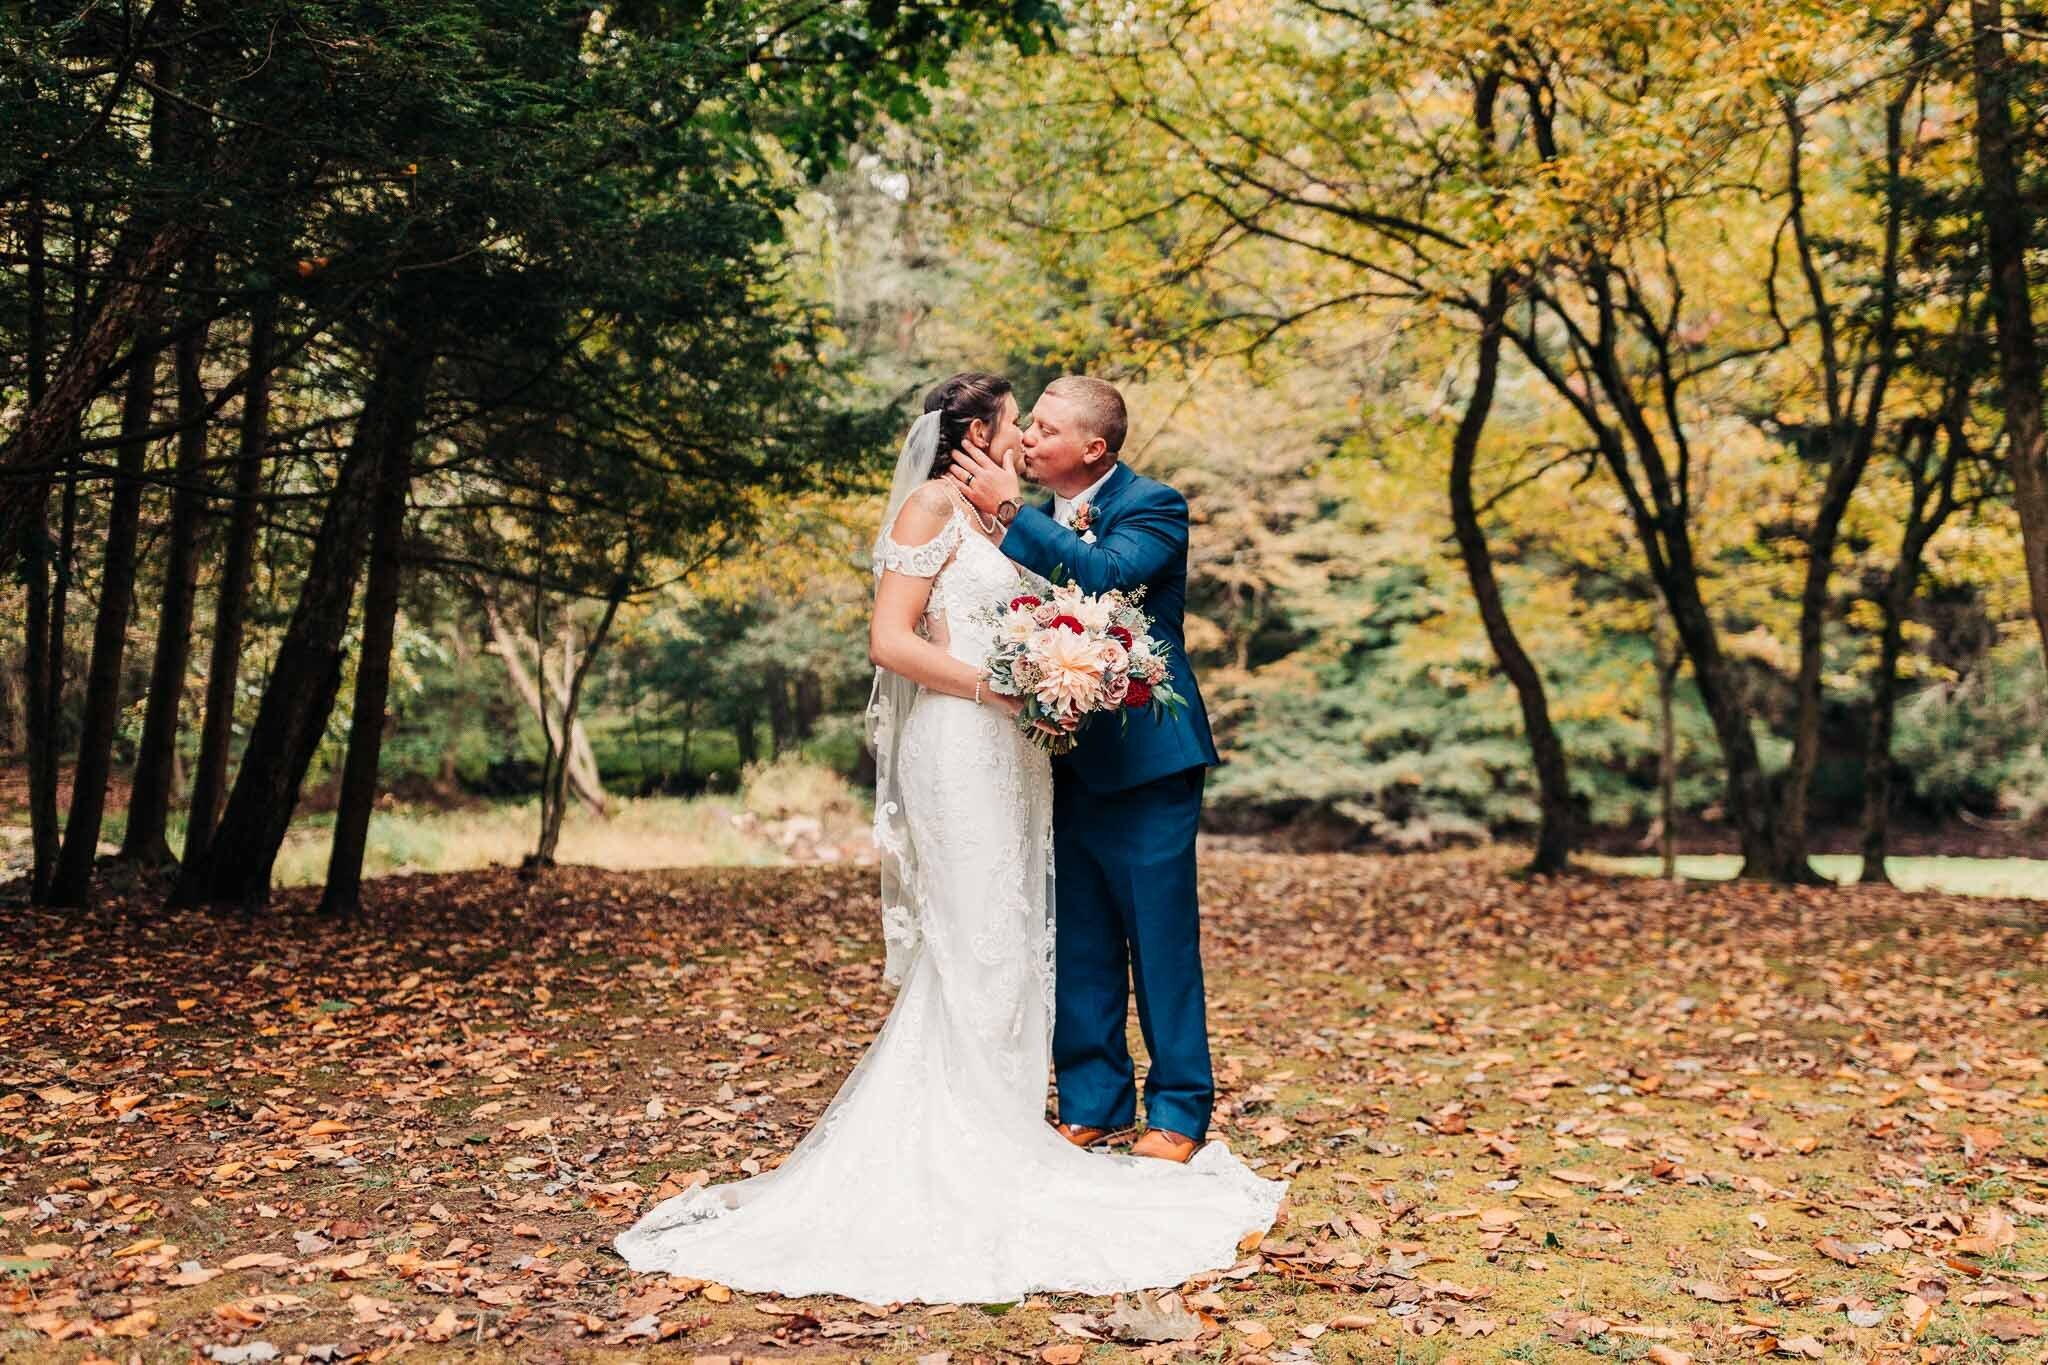 whitewoods-fall-wedding-8364.jpg